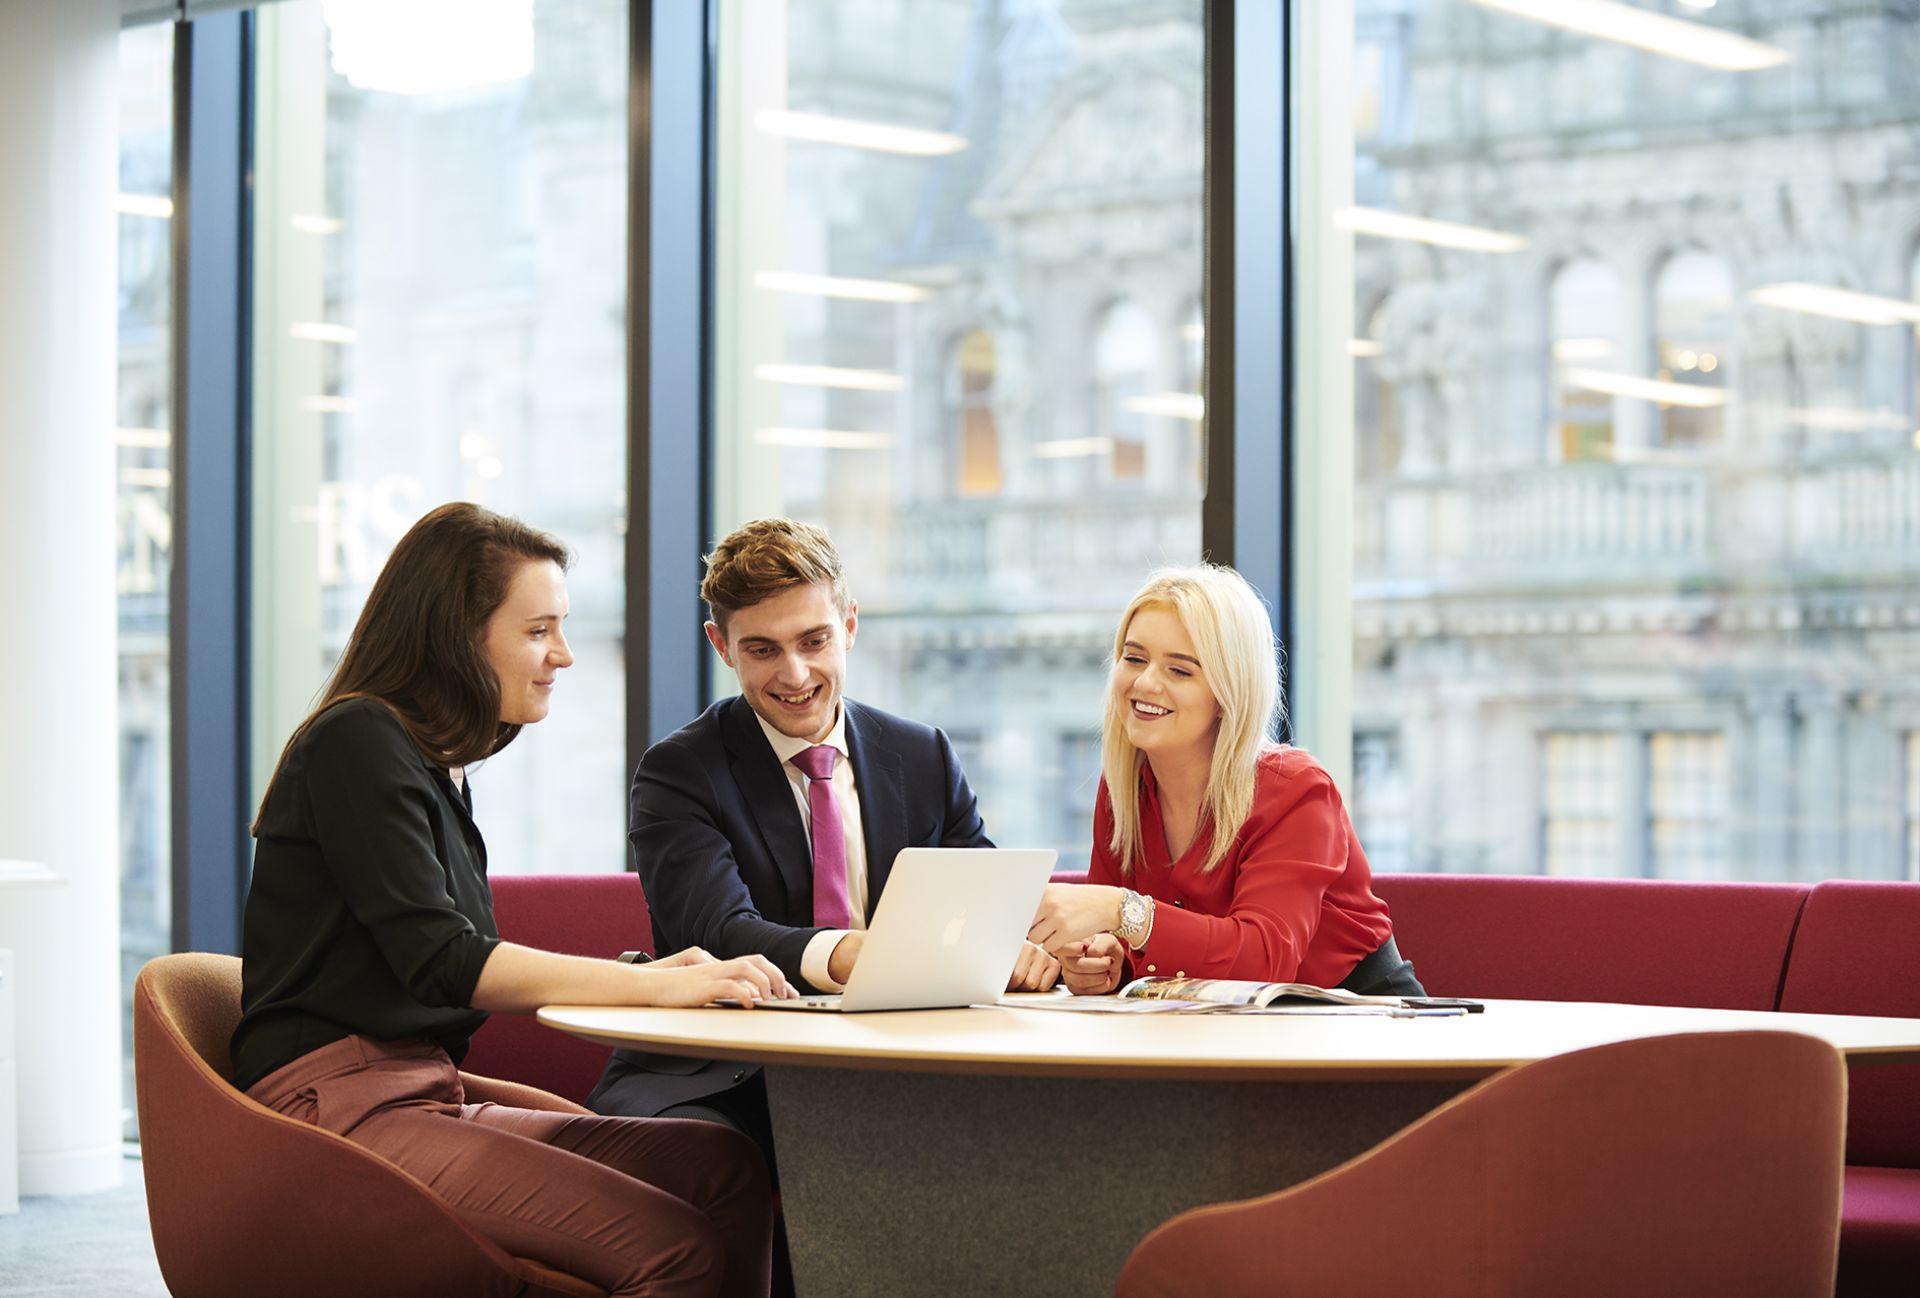 three people sitting round an office desk